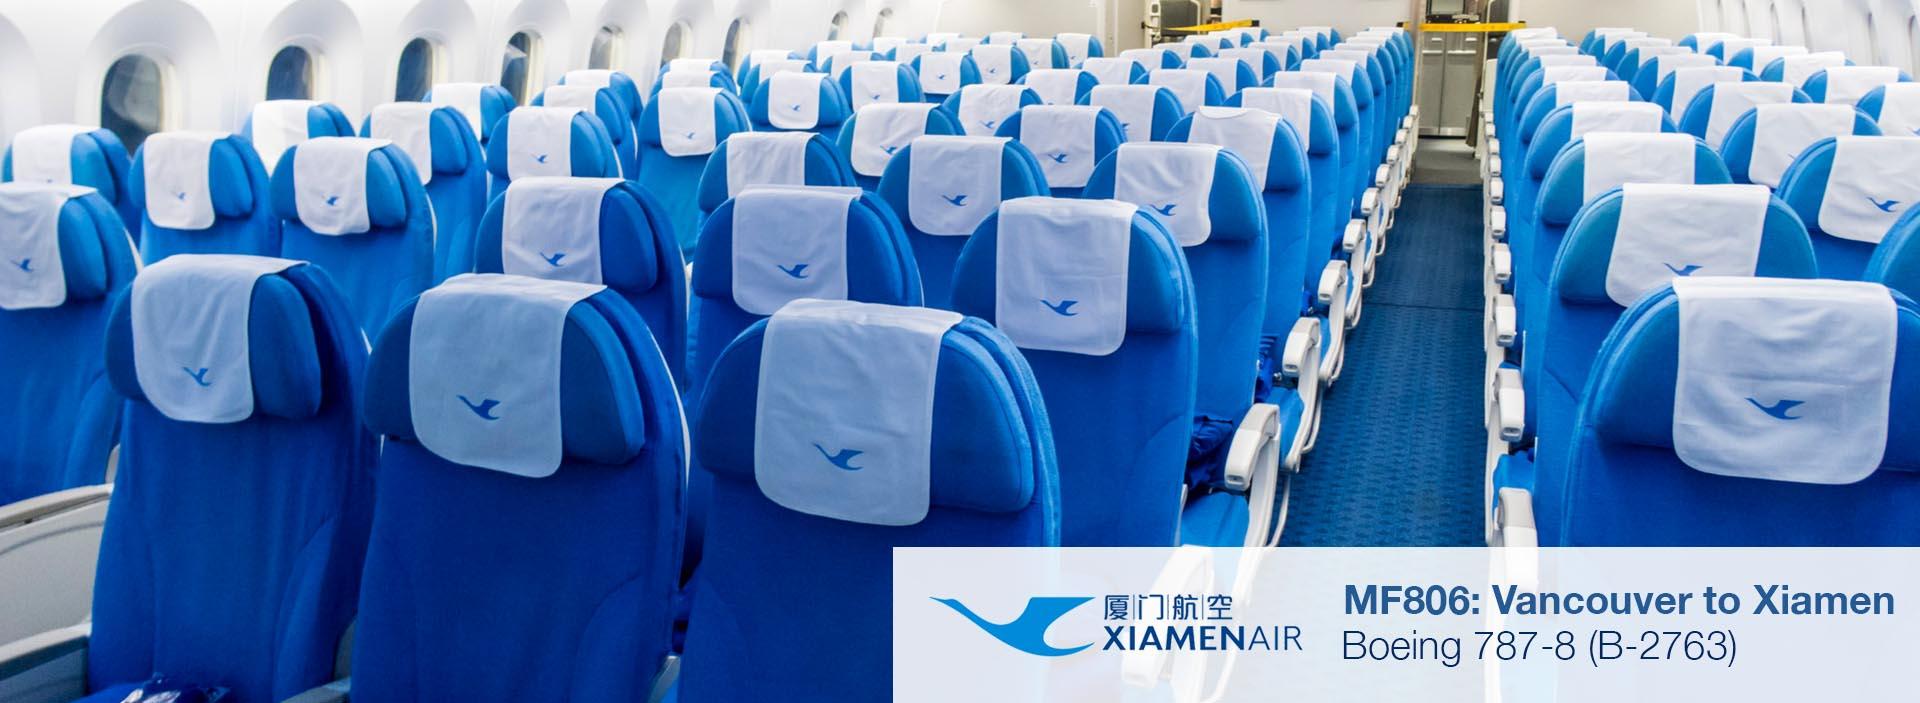 Flight Review: Xiamen Air 787-8 Economy Class from Vancouver to Xiamen